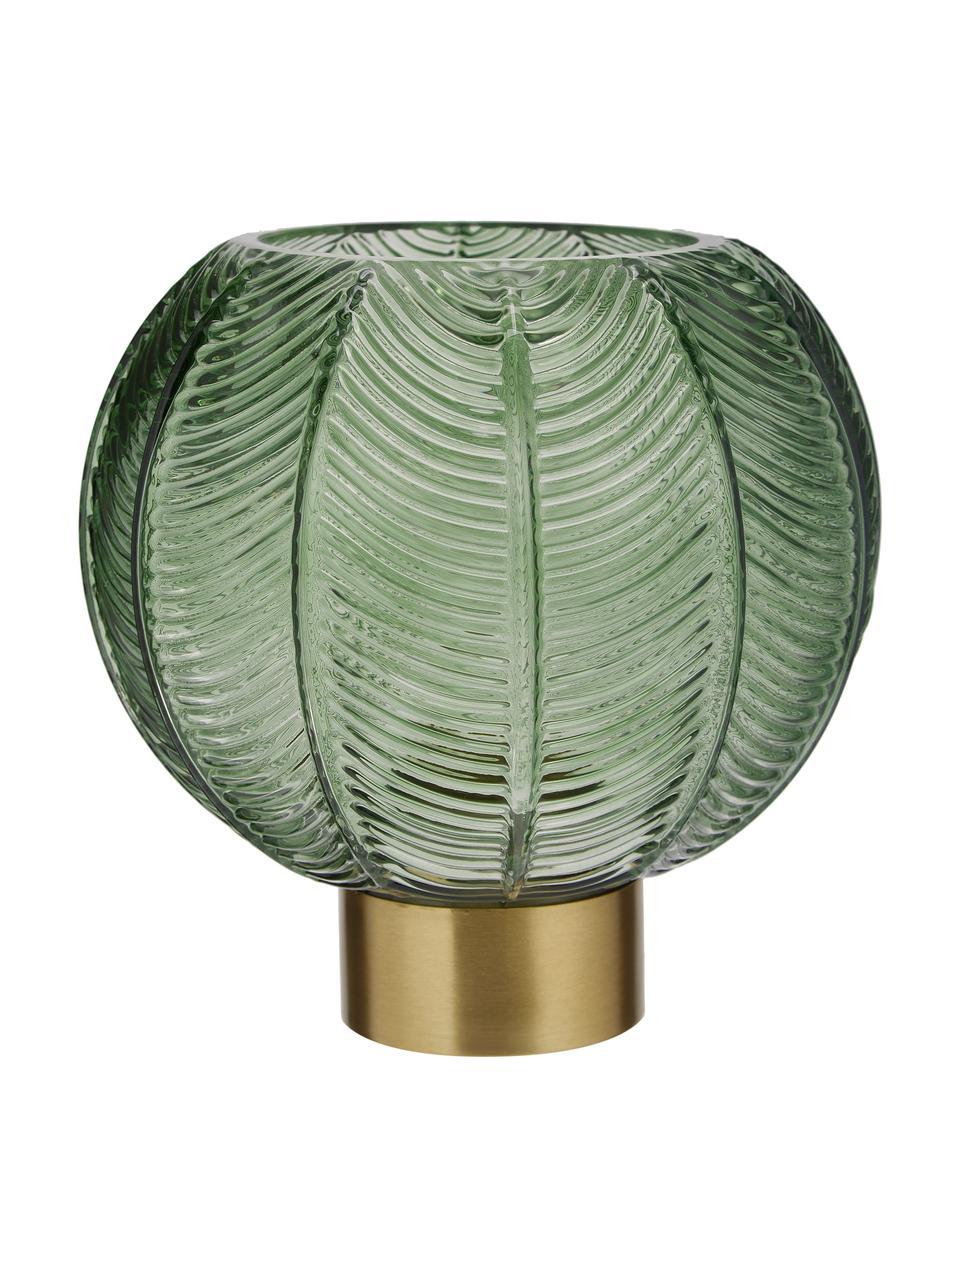 Vaso con base in ottone Mickey, Vaso: vetro, Vaso: verde, trasparente Base: ottone, Ø 20 x Alt. 21 cm